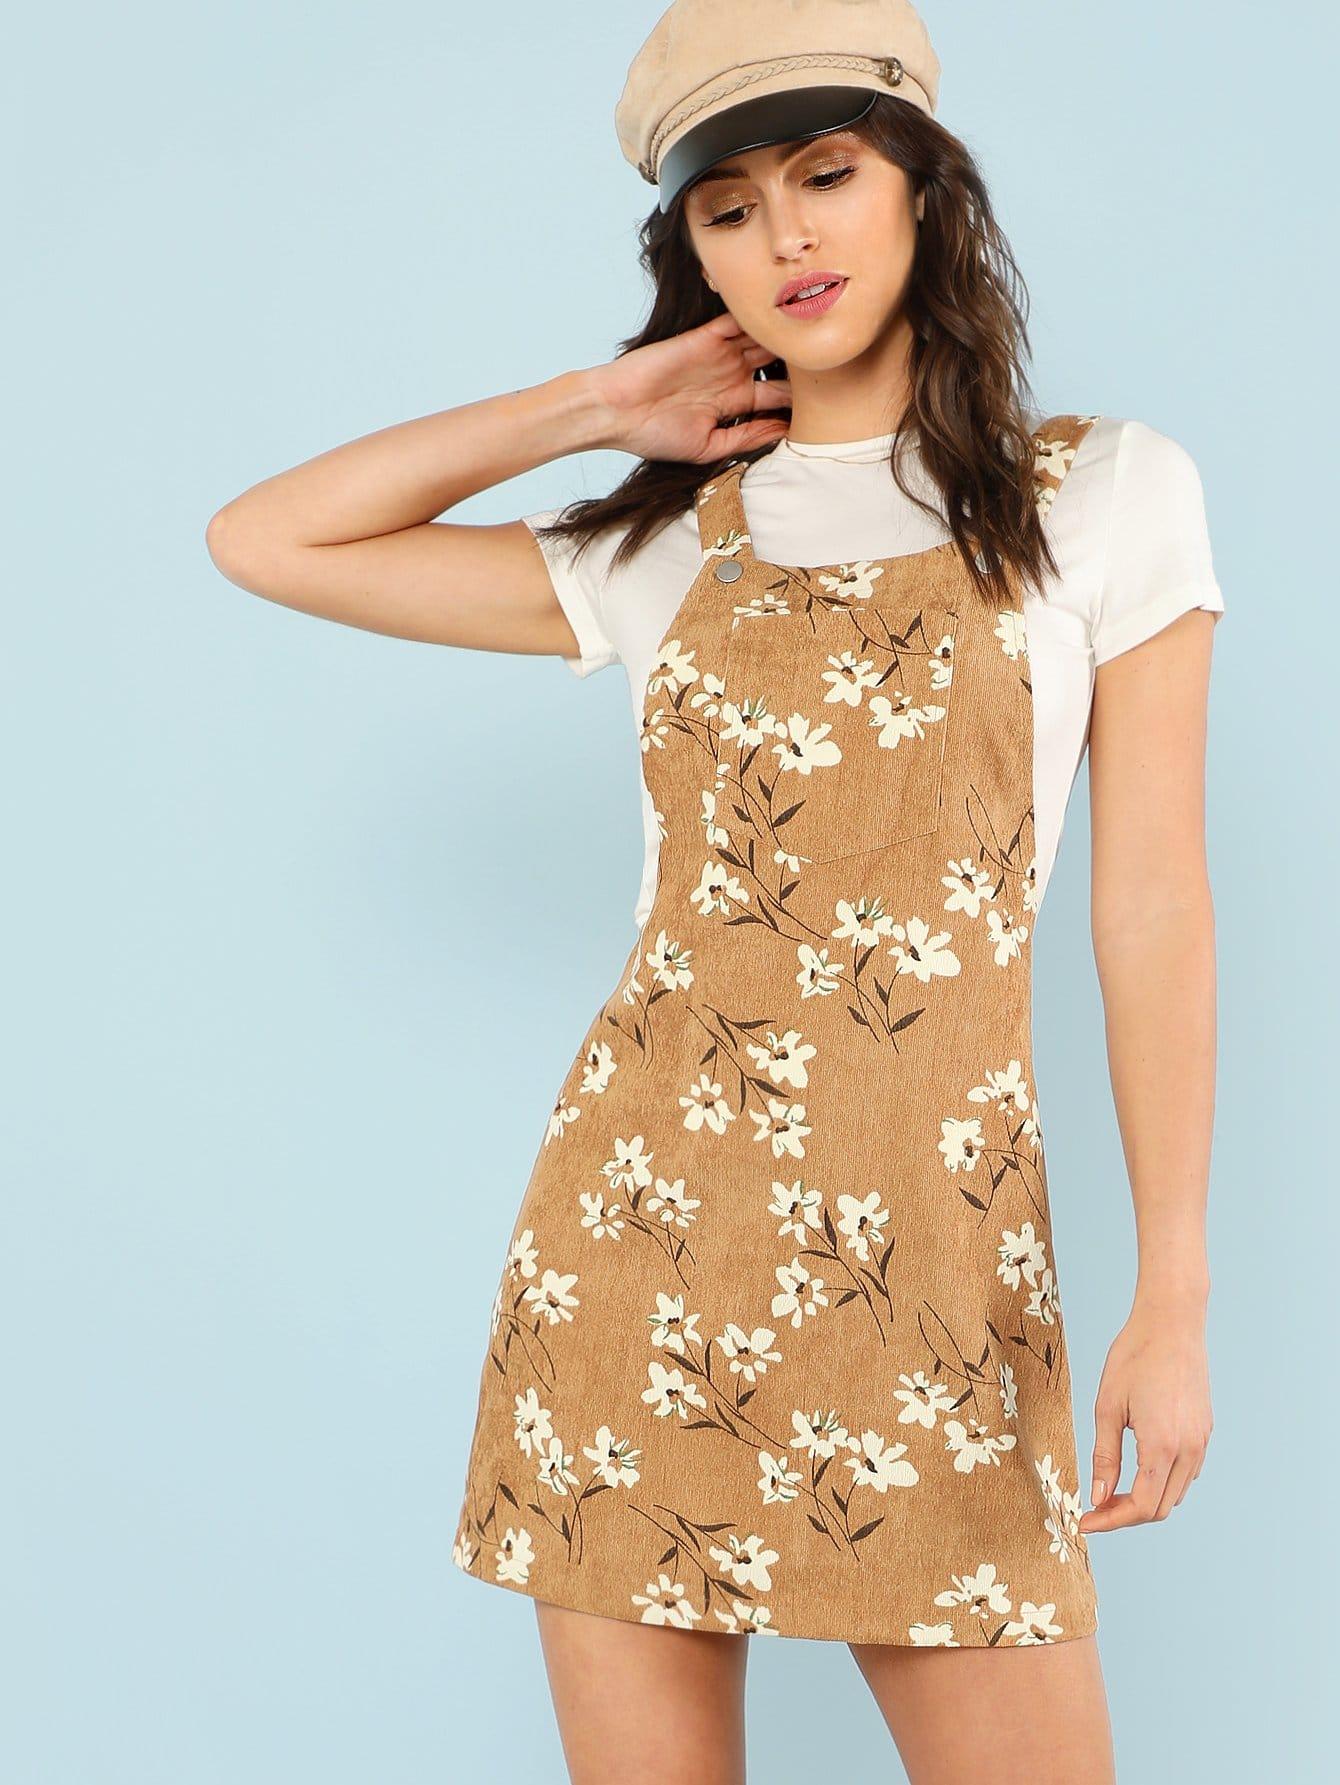 Daisy Print Overall Dress overall yumi overall